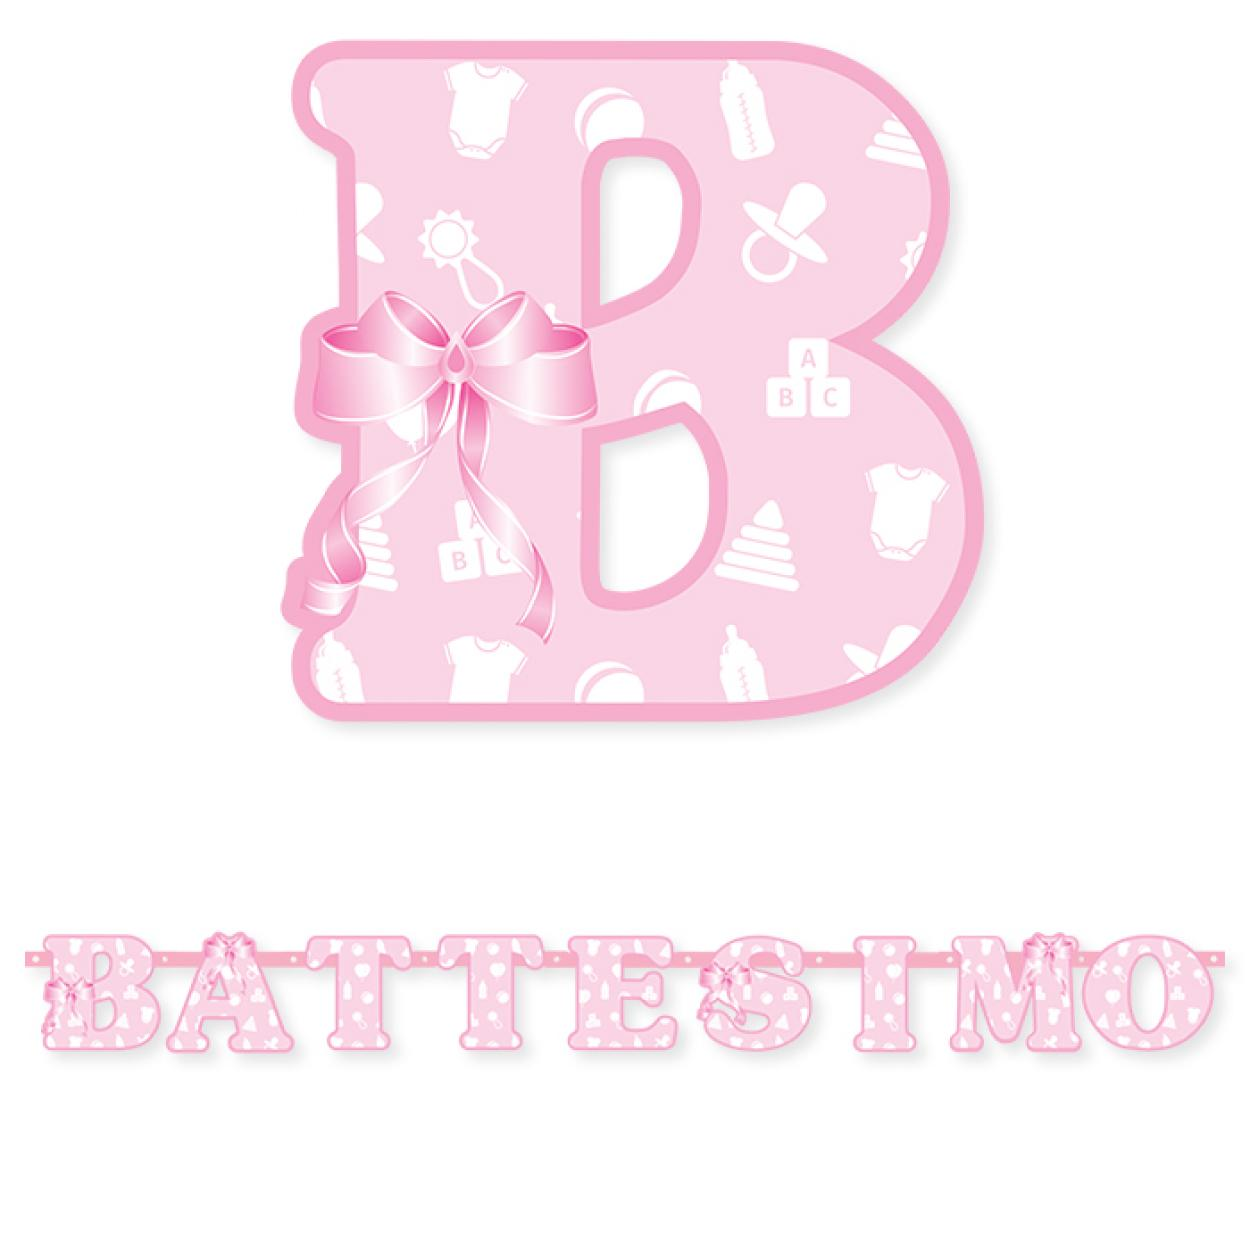 FESTONE BATTESIMO ROSA MT.1.35 74402